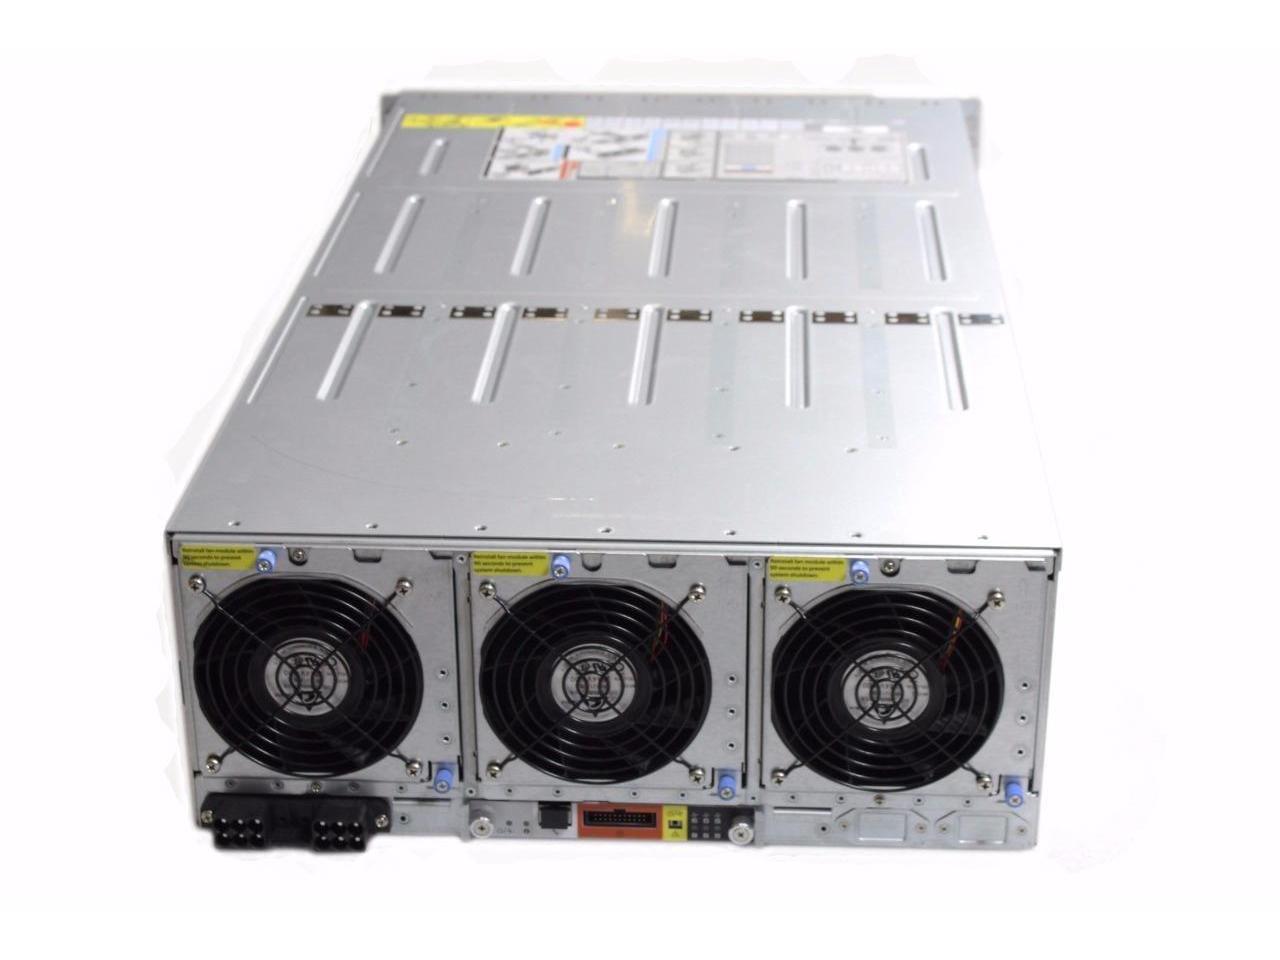 Empty Server Chassis With 3 Cooling Fan For Dell PowerEdge C8000 8000DC 6M5MV 06M5MV CN-06M5MV P1332 JTTJ4